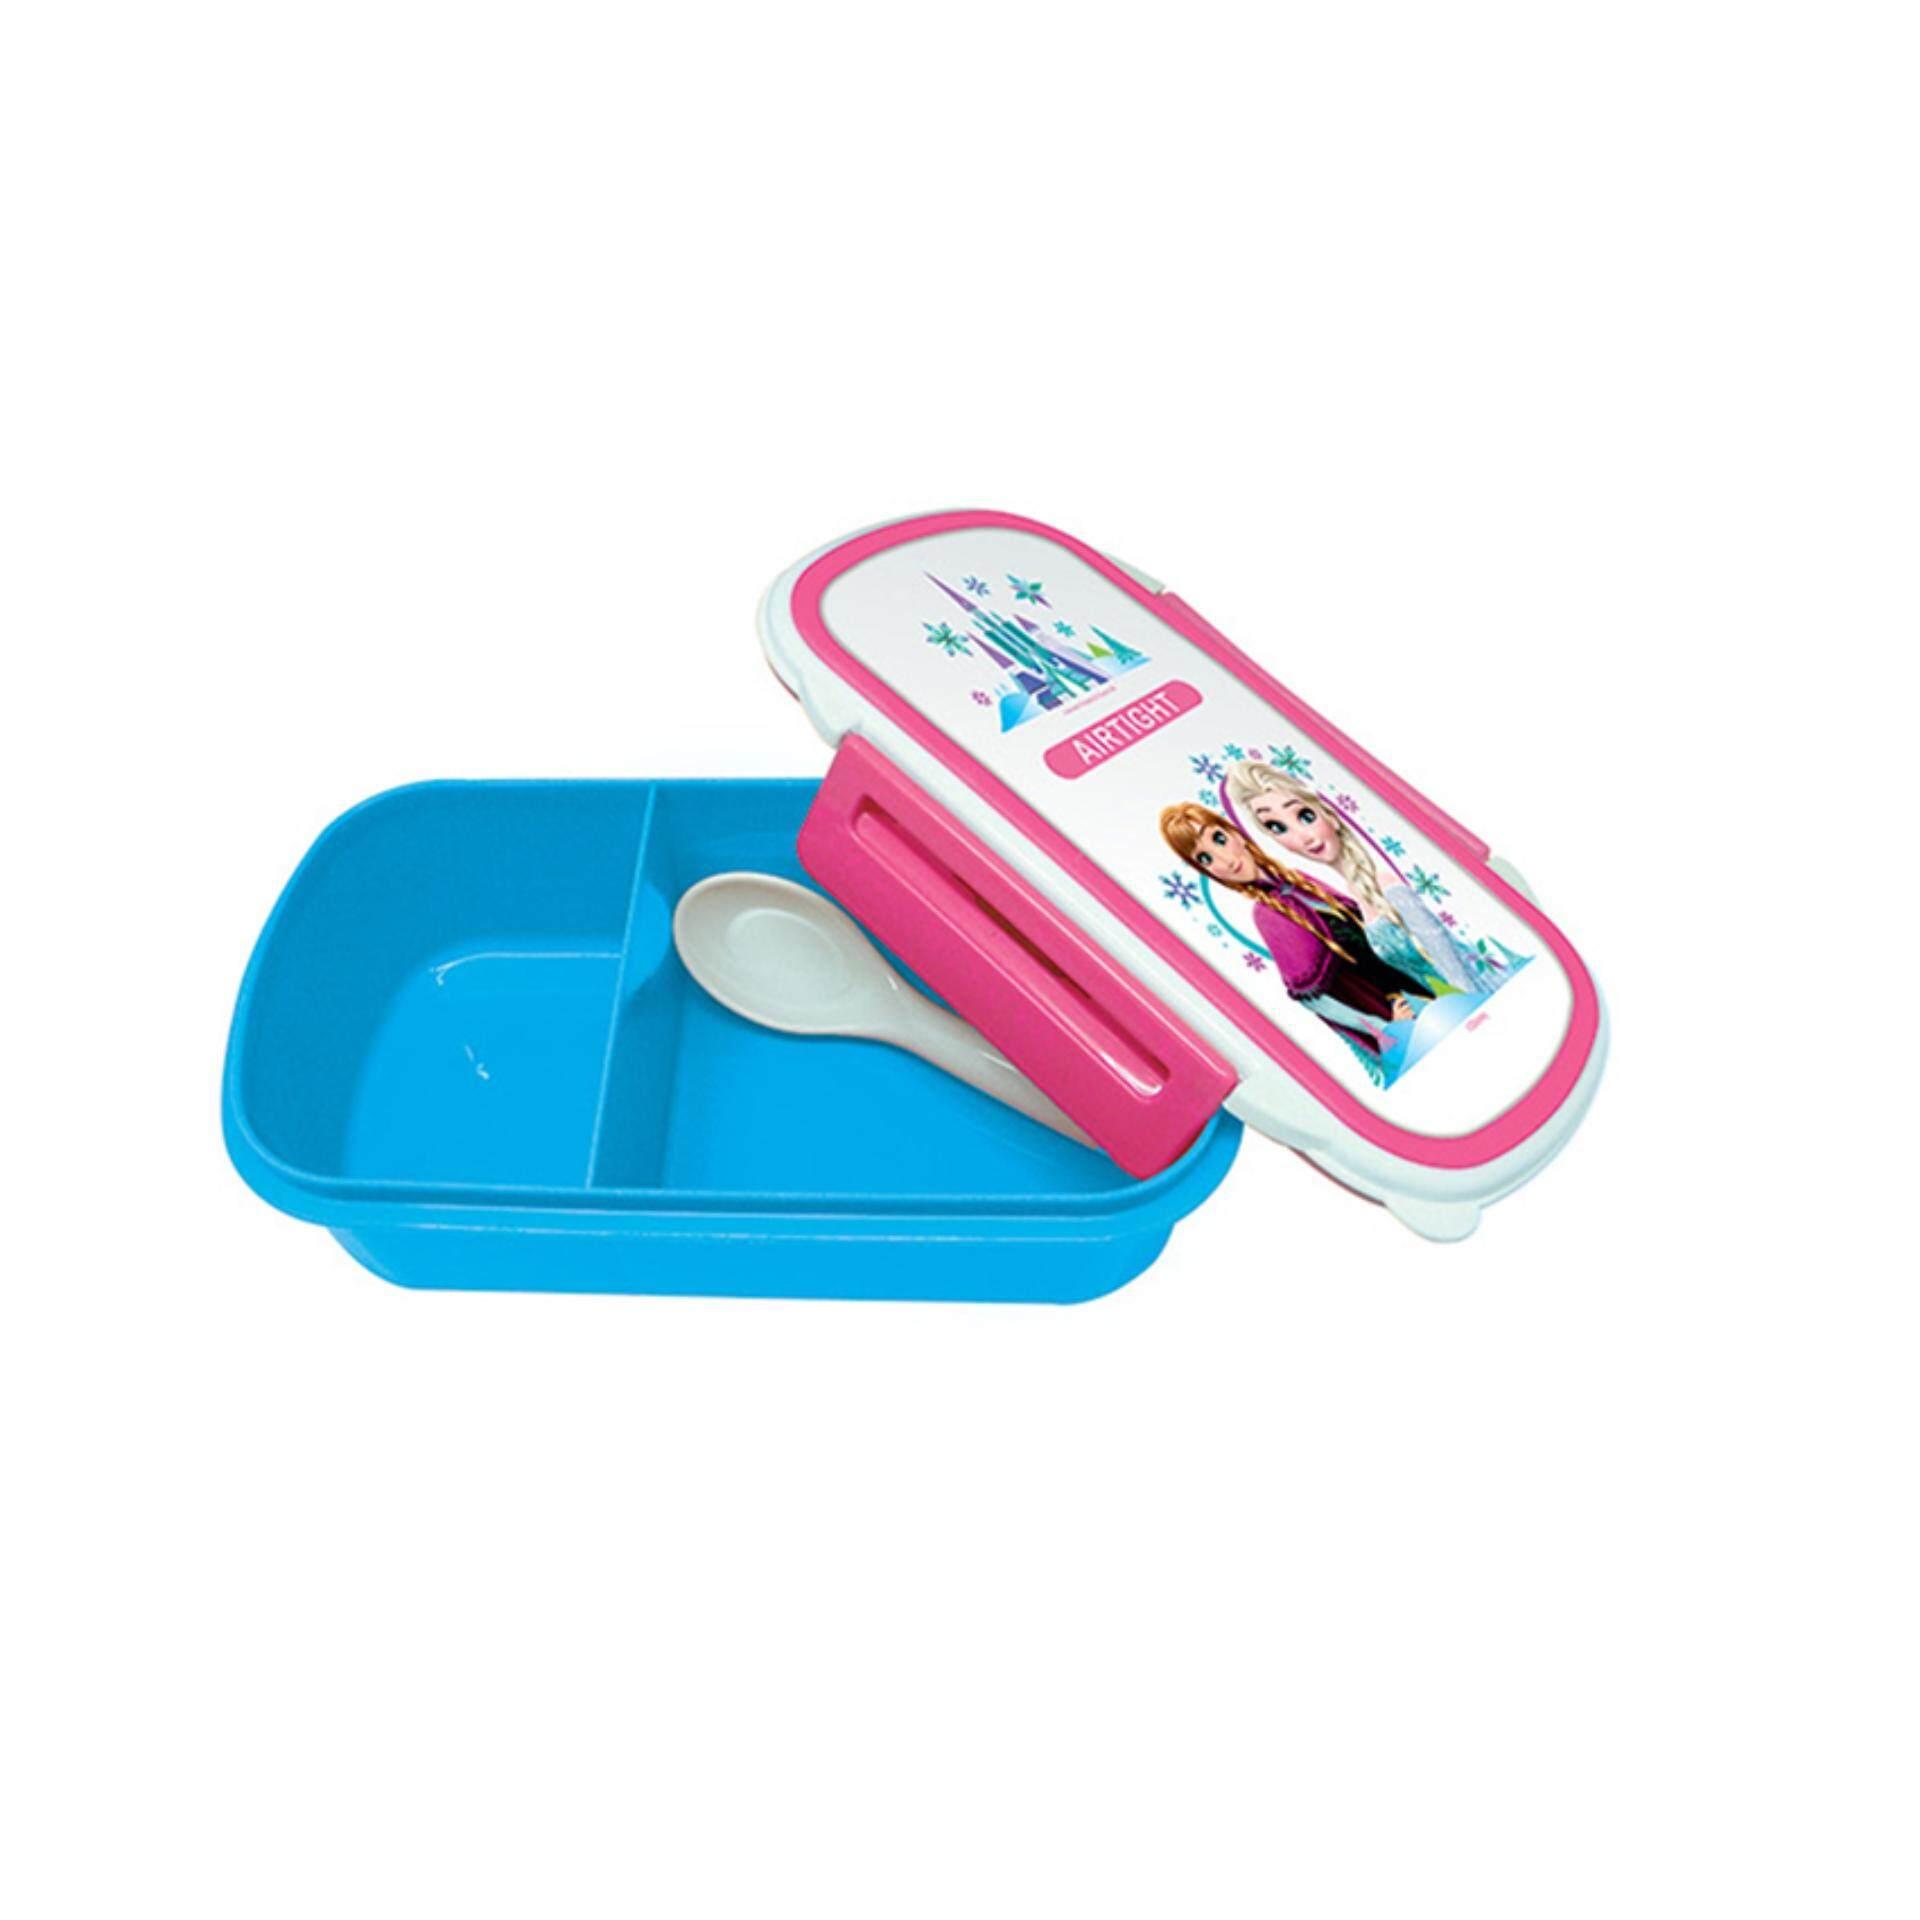 Disney Frozen Lunch Box With Spoon Set - Blue Colour